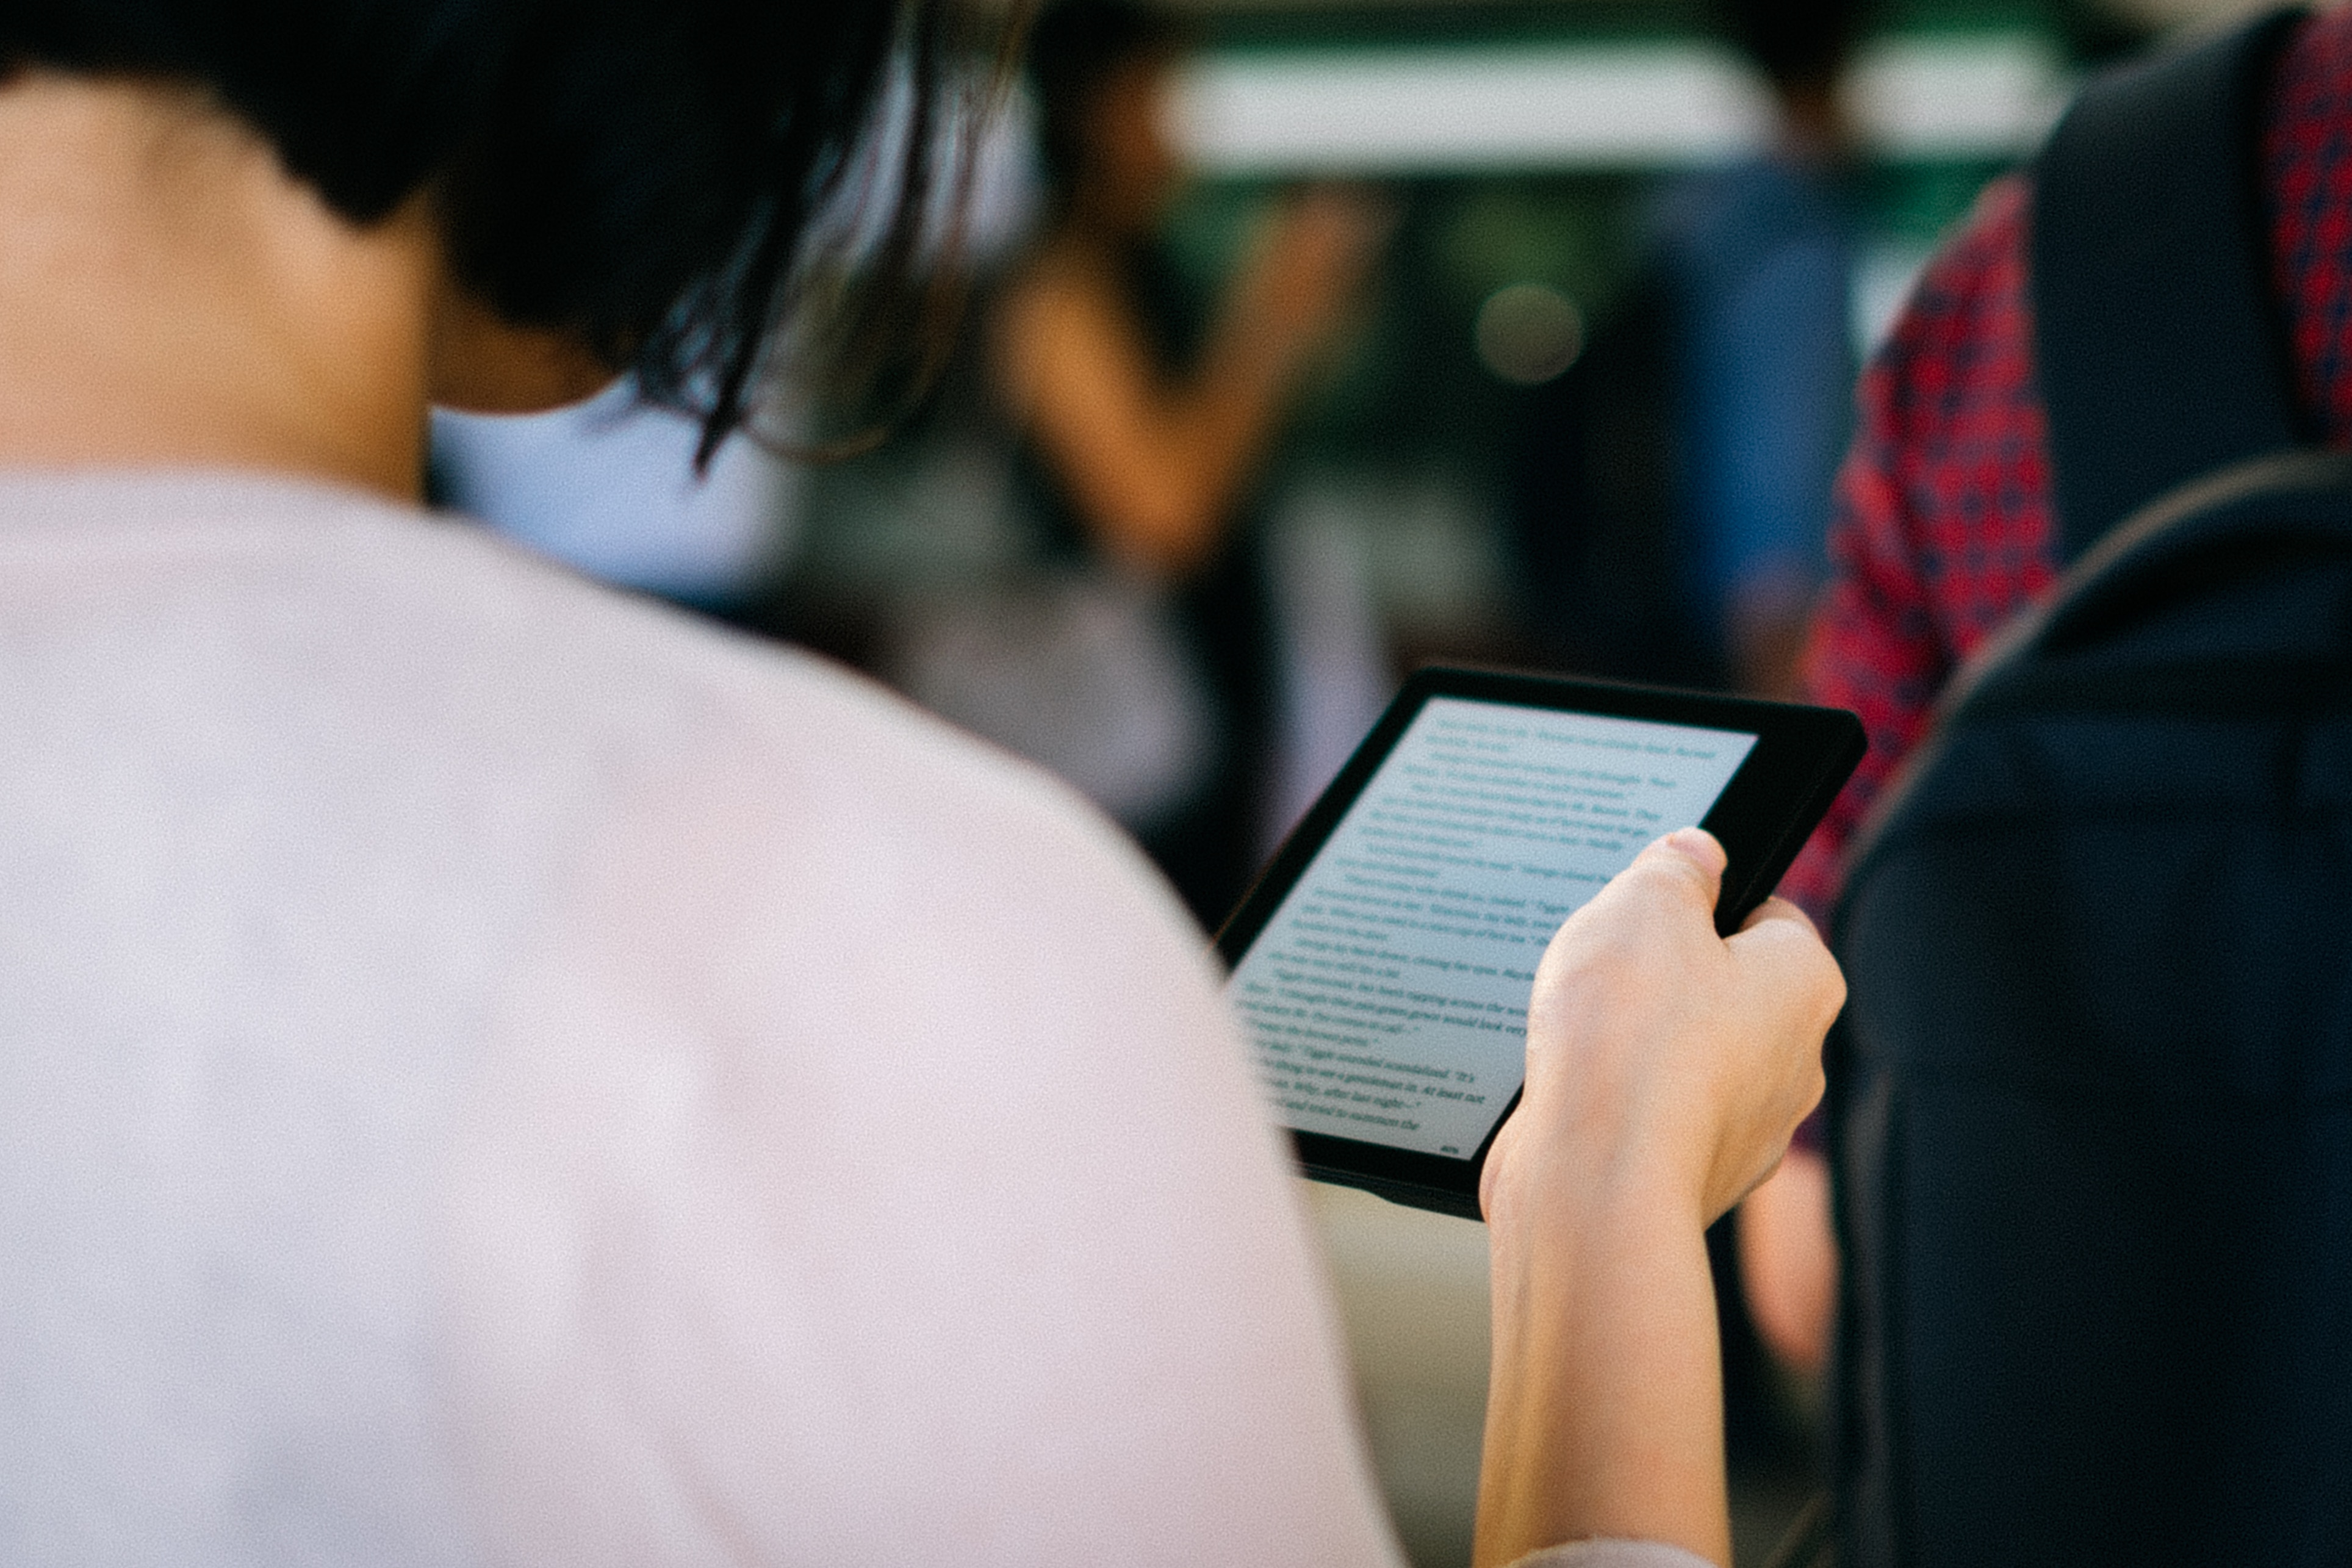 Reading is a major part of postgrad life